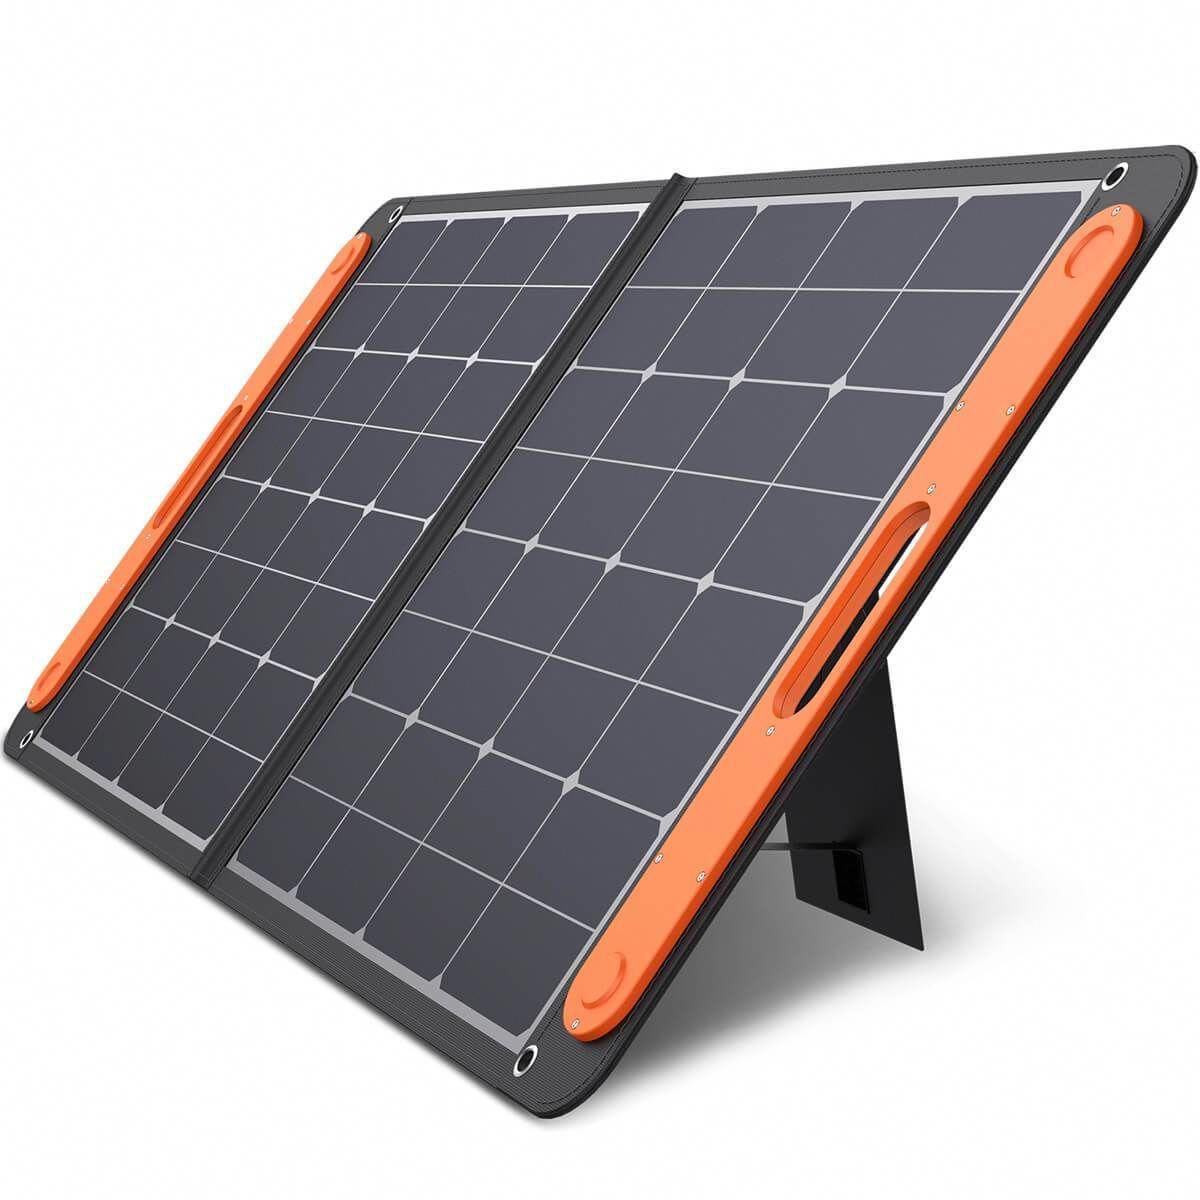 100w Solar Panel Foldable With Usb Dc Ports Jackery Solarpanels Solarenergy Solarpower Solargenera In 2020 Portable Solar Panels Solar Panels Solar Panel Charger